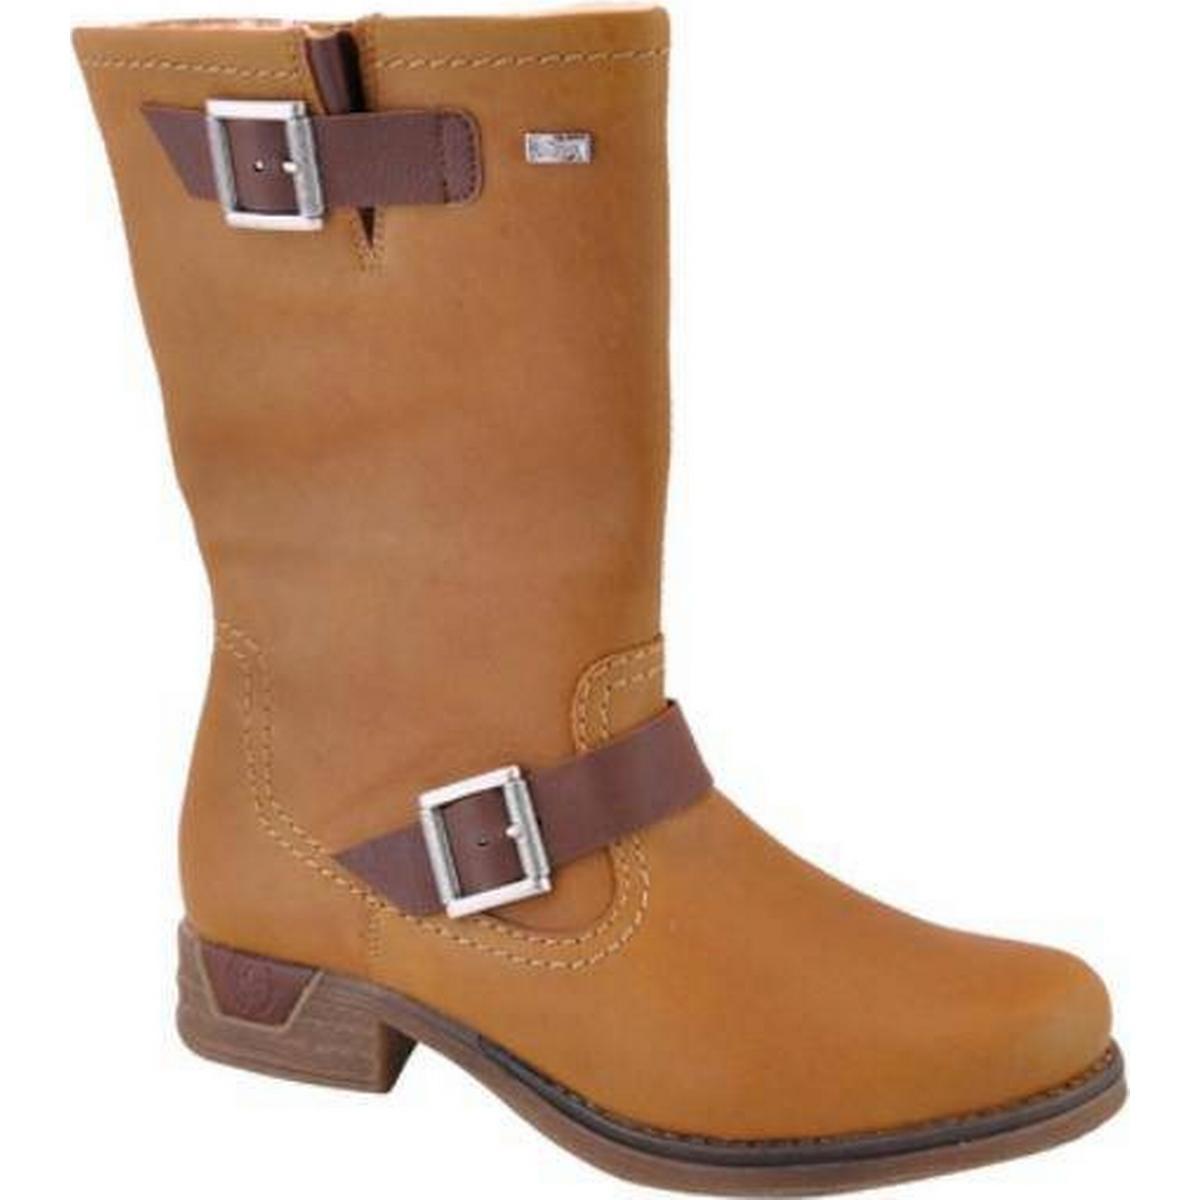 70829 24 Cayenne, Sko, Boots, Kraftige Støvler, Rød, Dame, 37